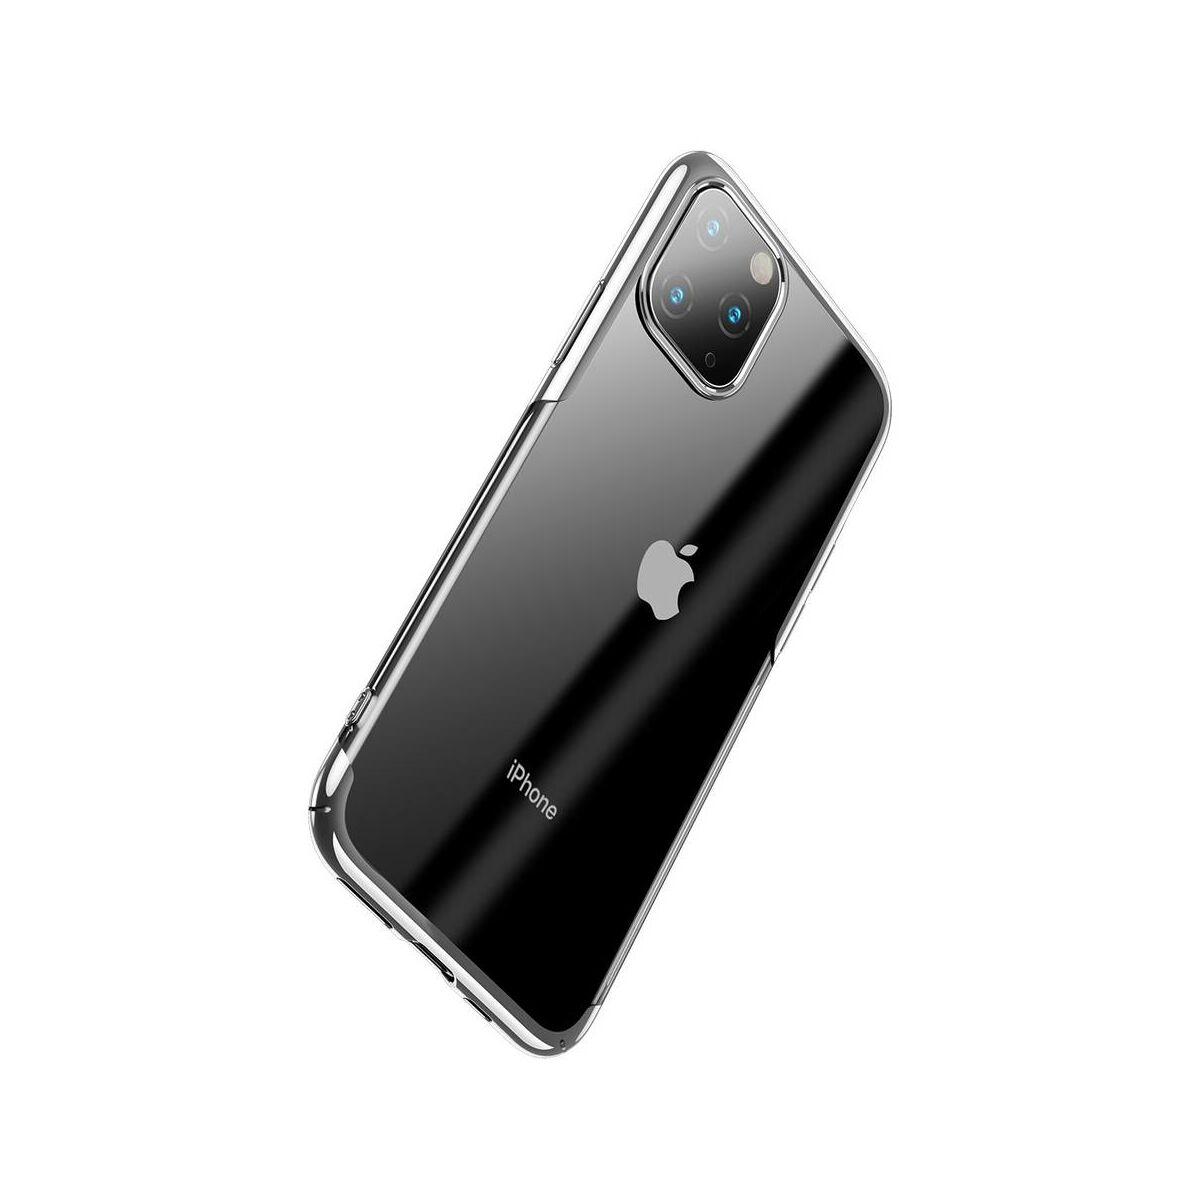 Baseus iPhone 11 Pro tok, Glitter, ezüst (WIAPIPH58S-DW0S)